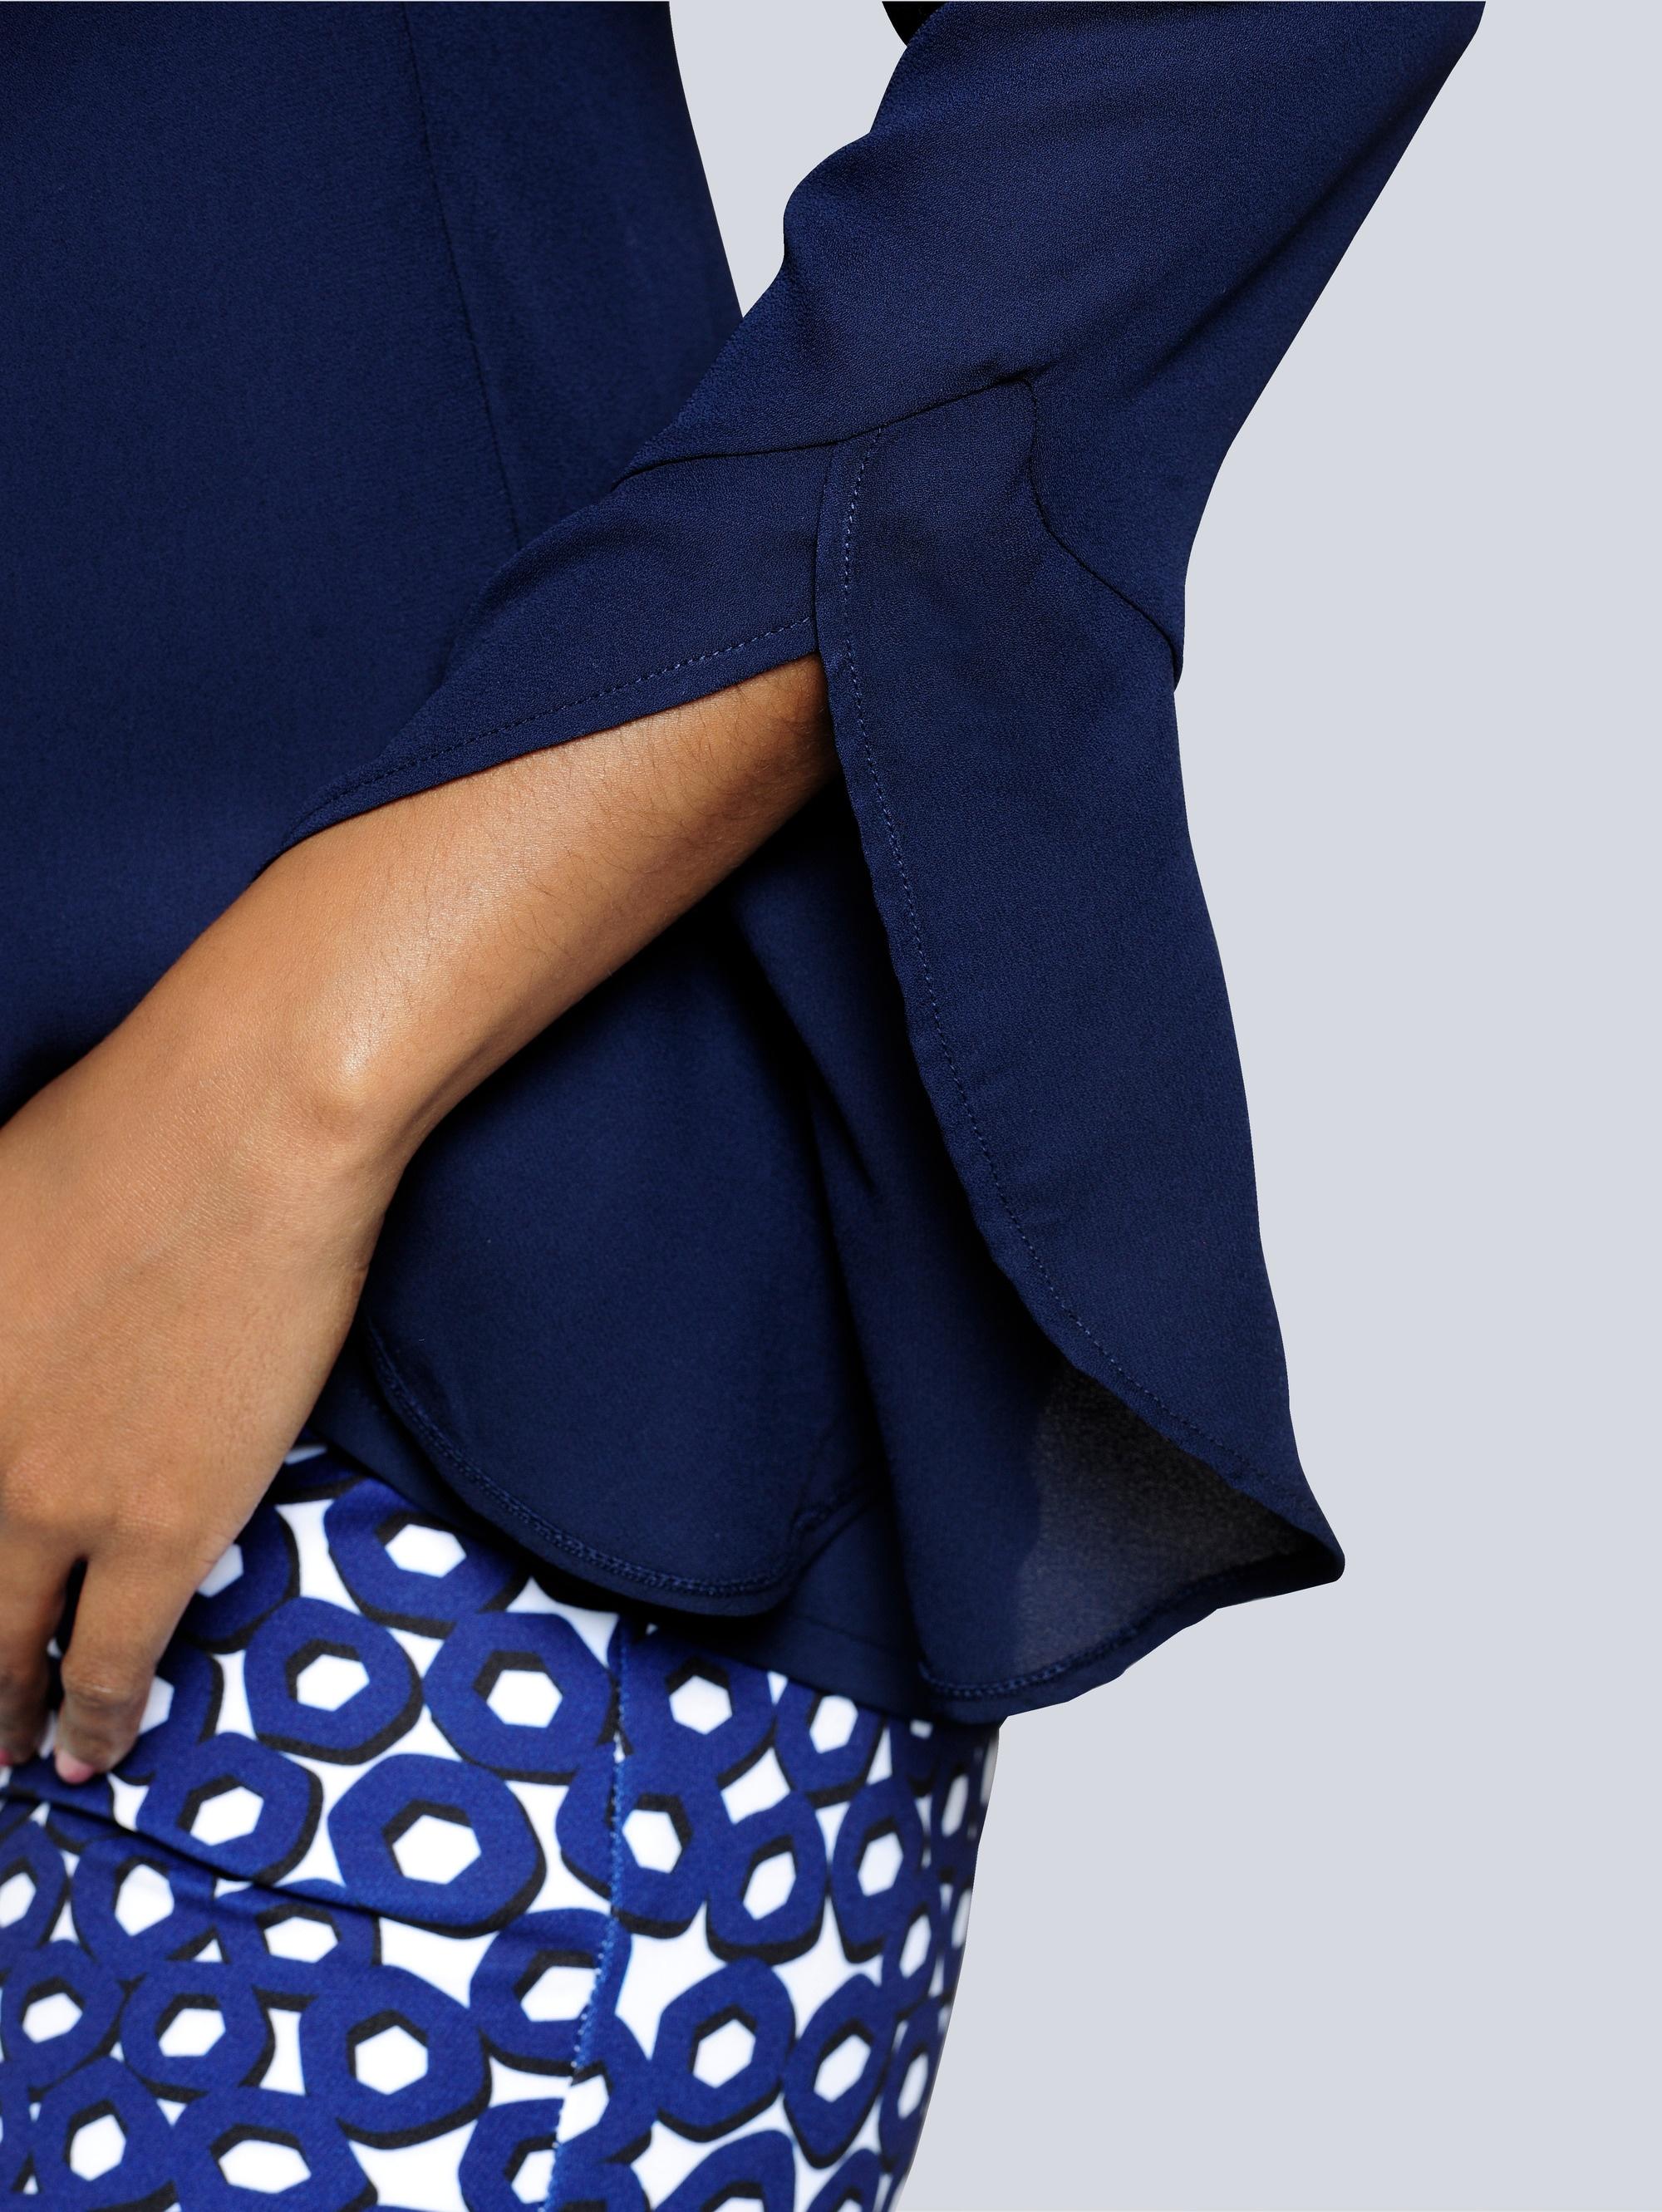 Alba Moda Bluse effektvoller Armabschluss mit Volants